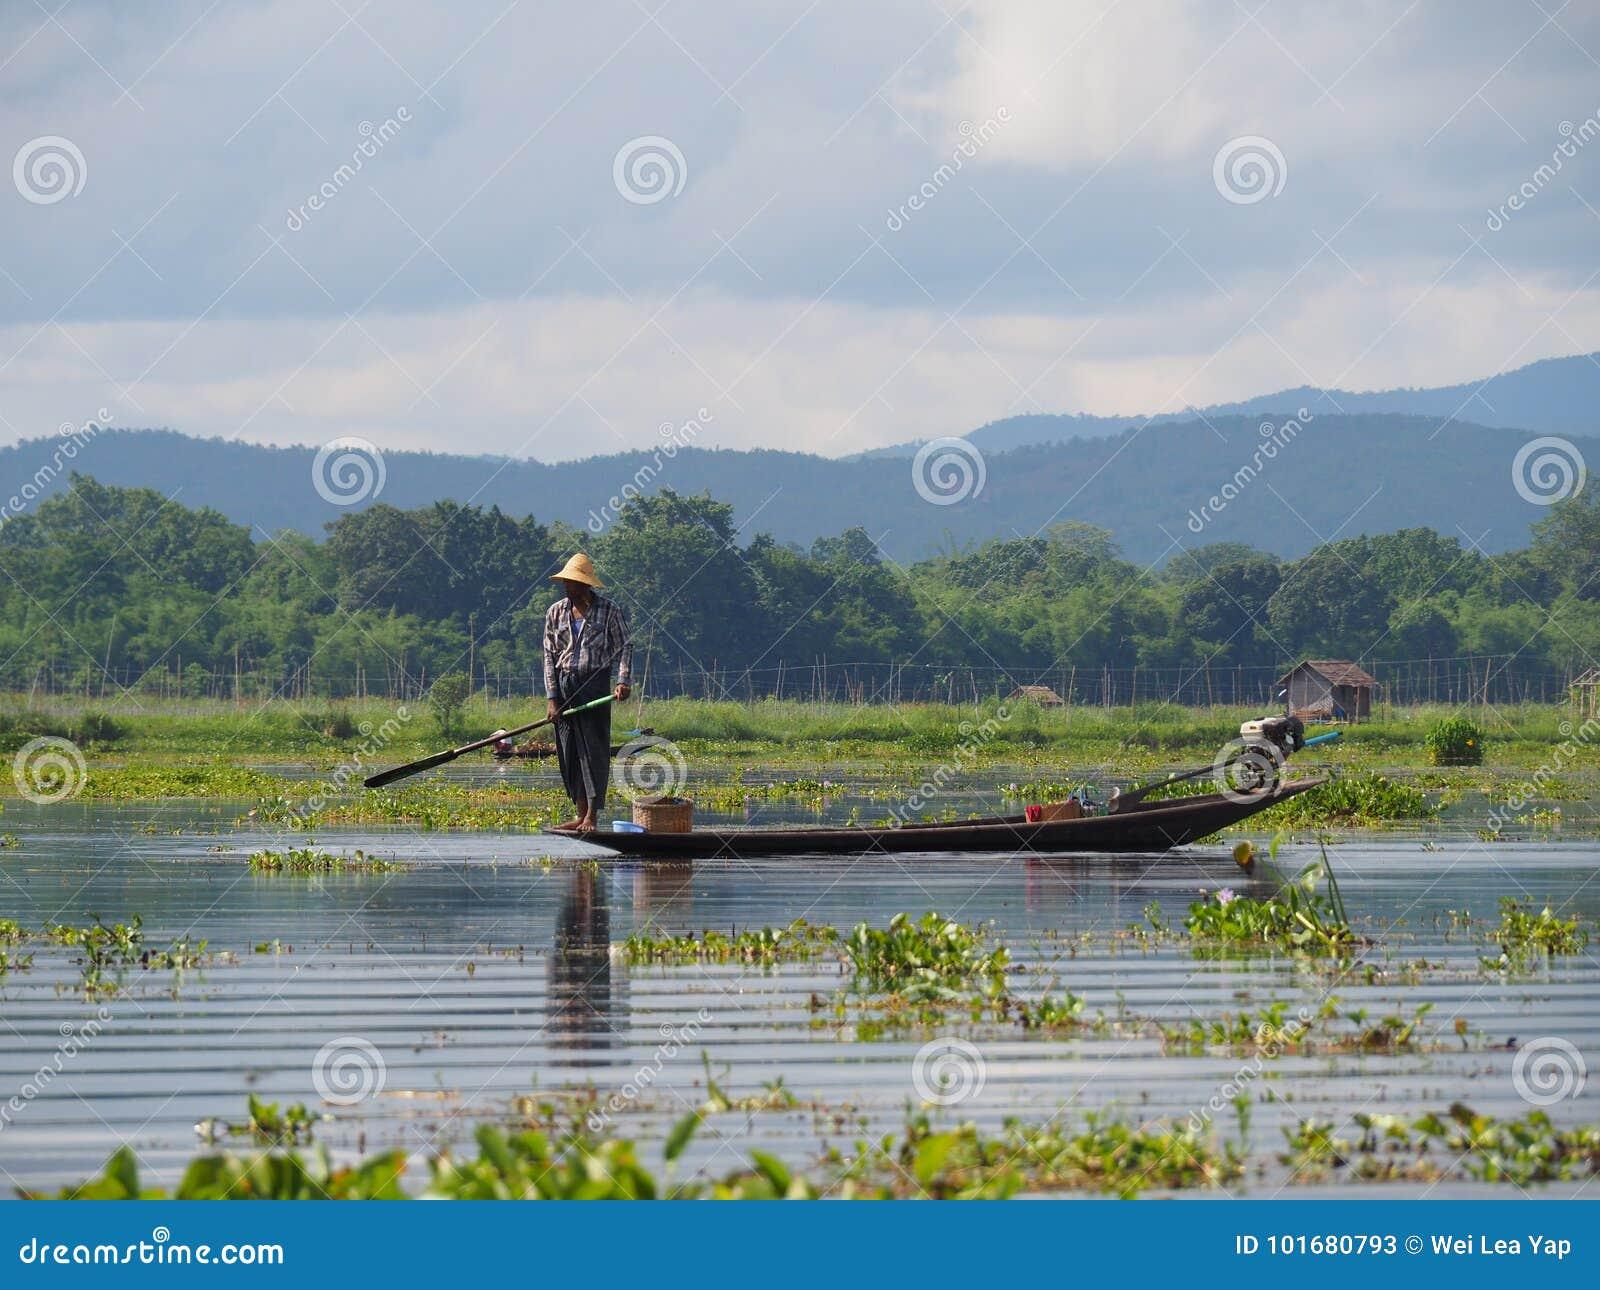 Single fisherman dating